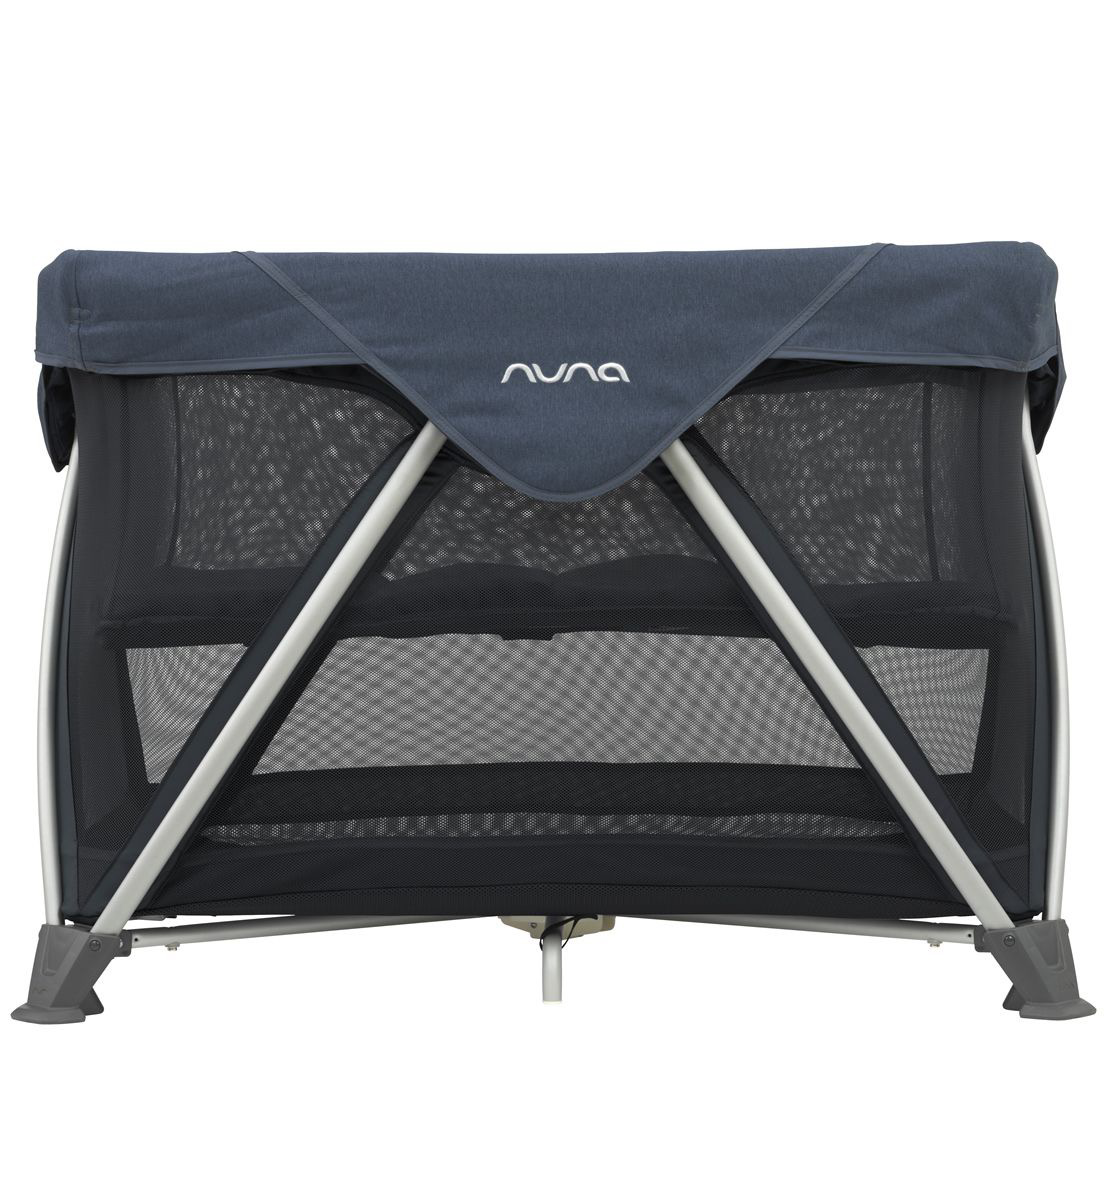 Nuna Sena Aire Full Size Playard Aspen Leather diaper